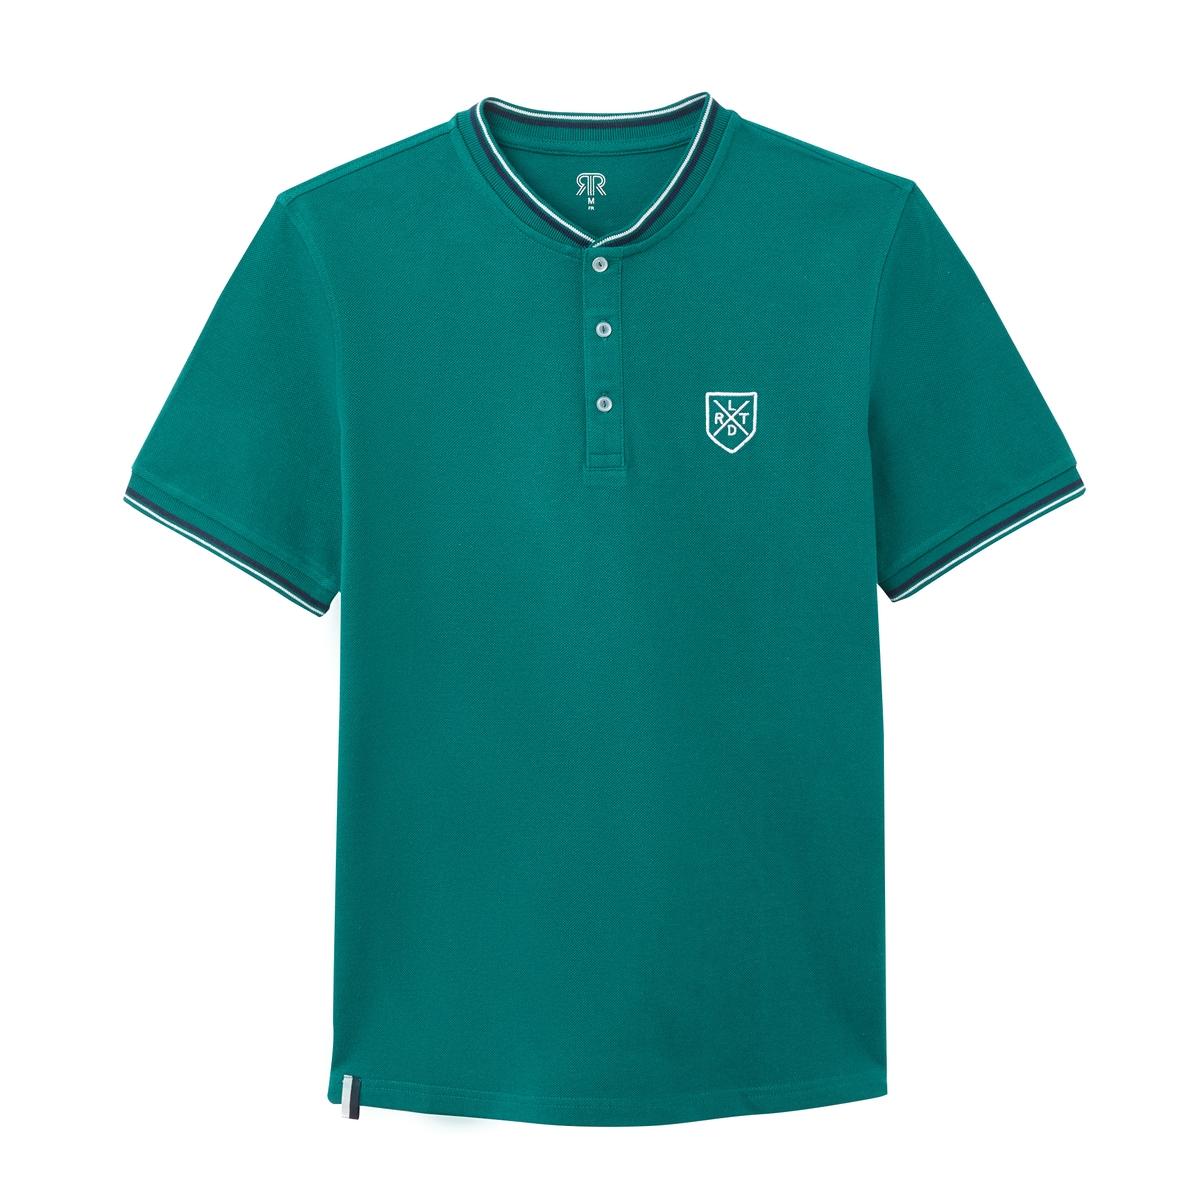 Футболка-поло La Redoute С тунисским вырезом и короткими рукавами S зеленый футболка с тунисским вырезом из 100% хлопка с эффектом фламме